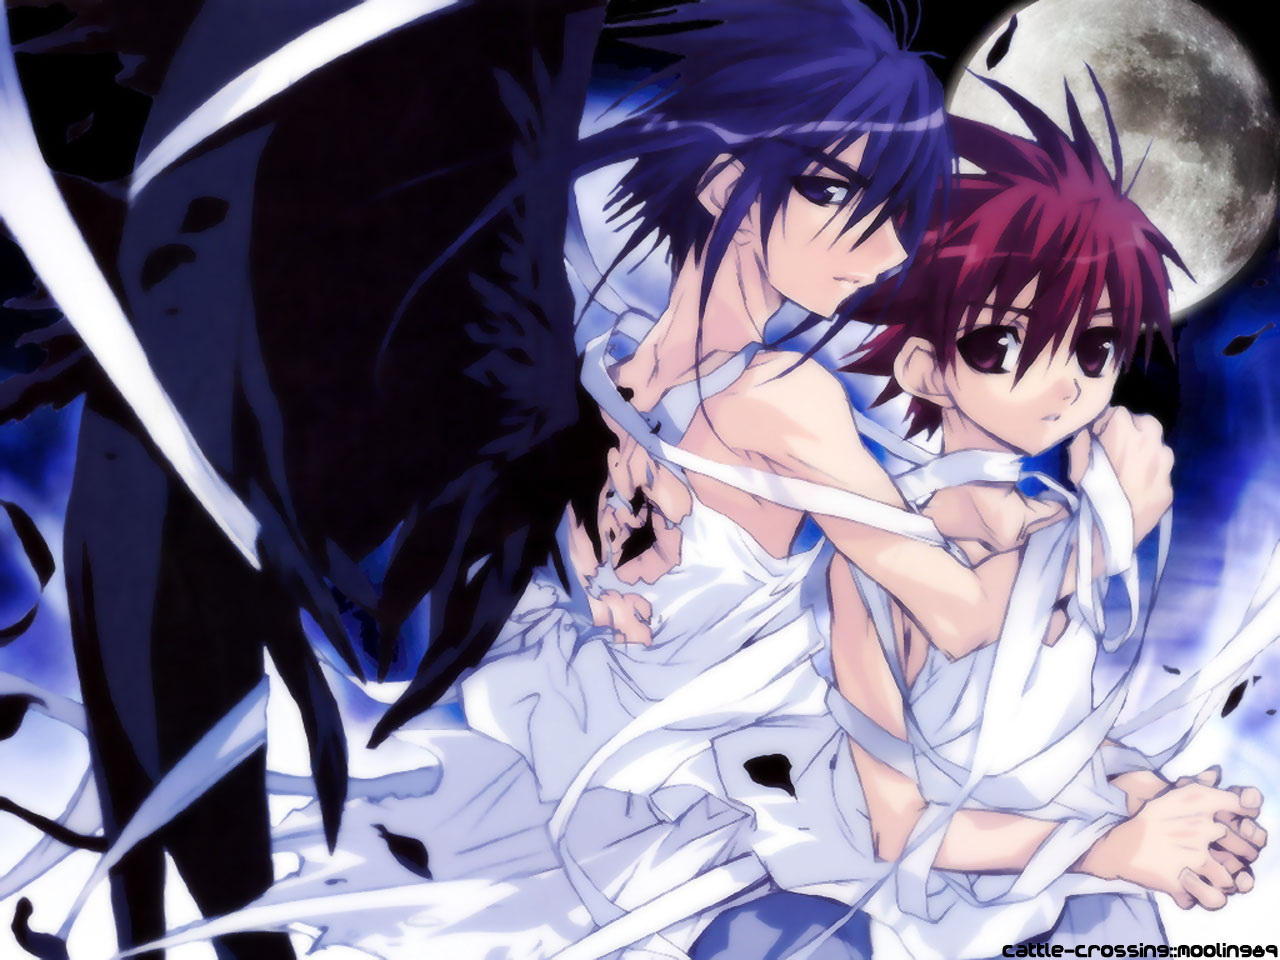 dark_mousy dnangel moon niwa_daisuke ribbons torn_clothes wings